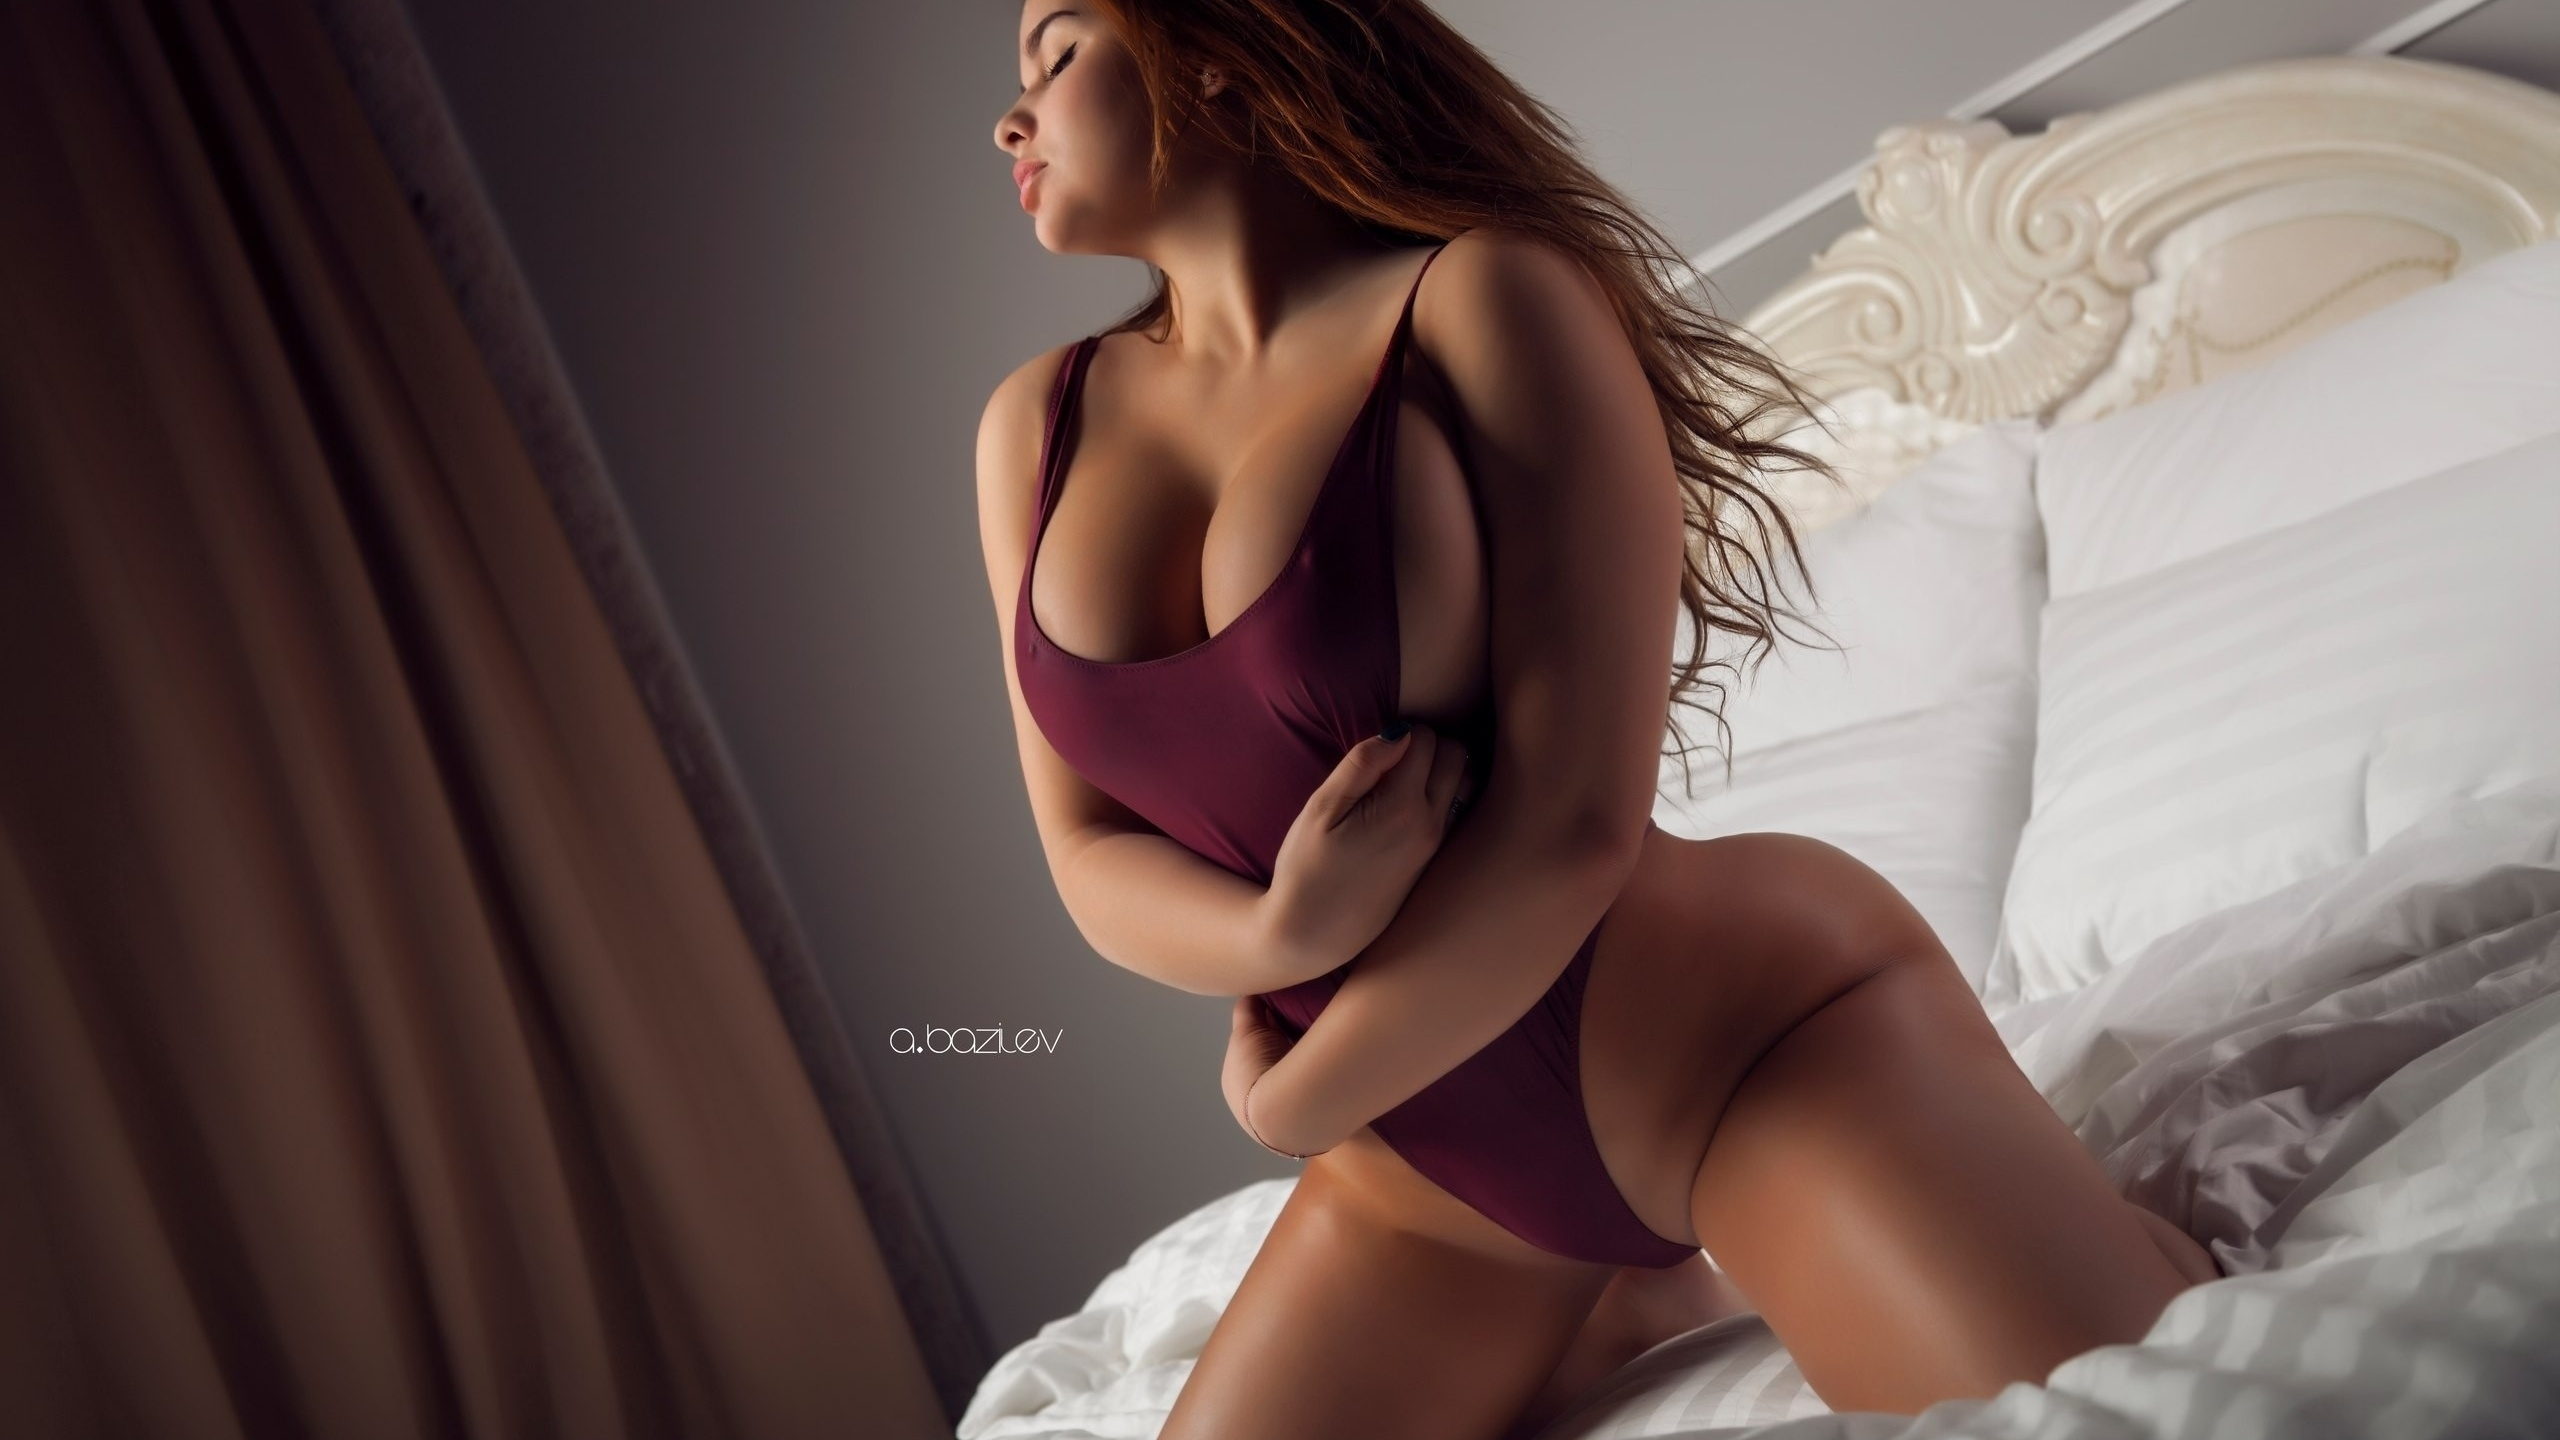 Hot ass sexy art models nu, nude chubby girl pics